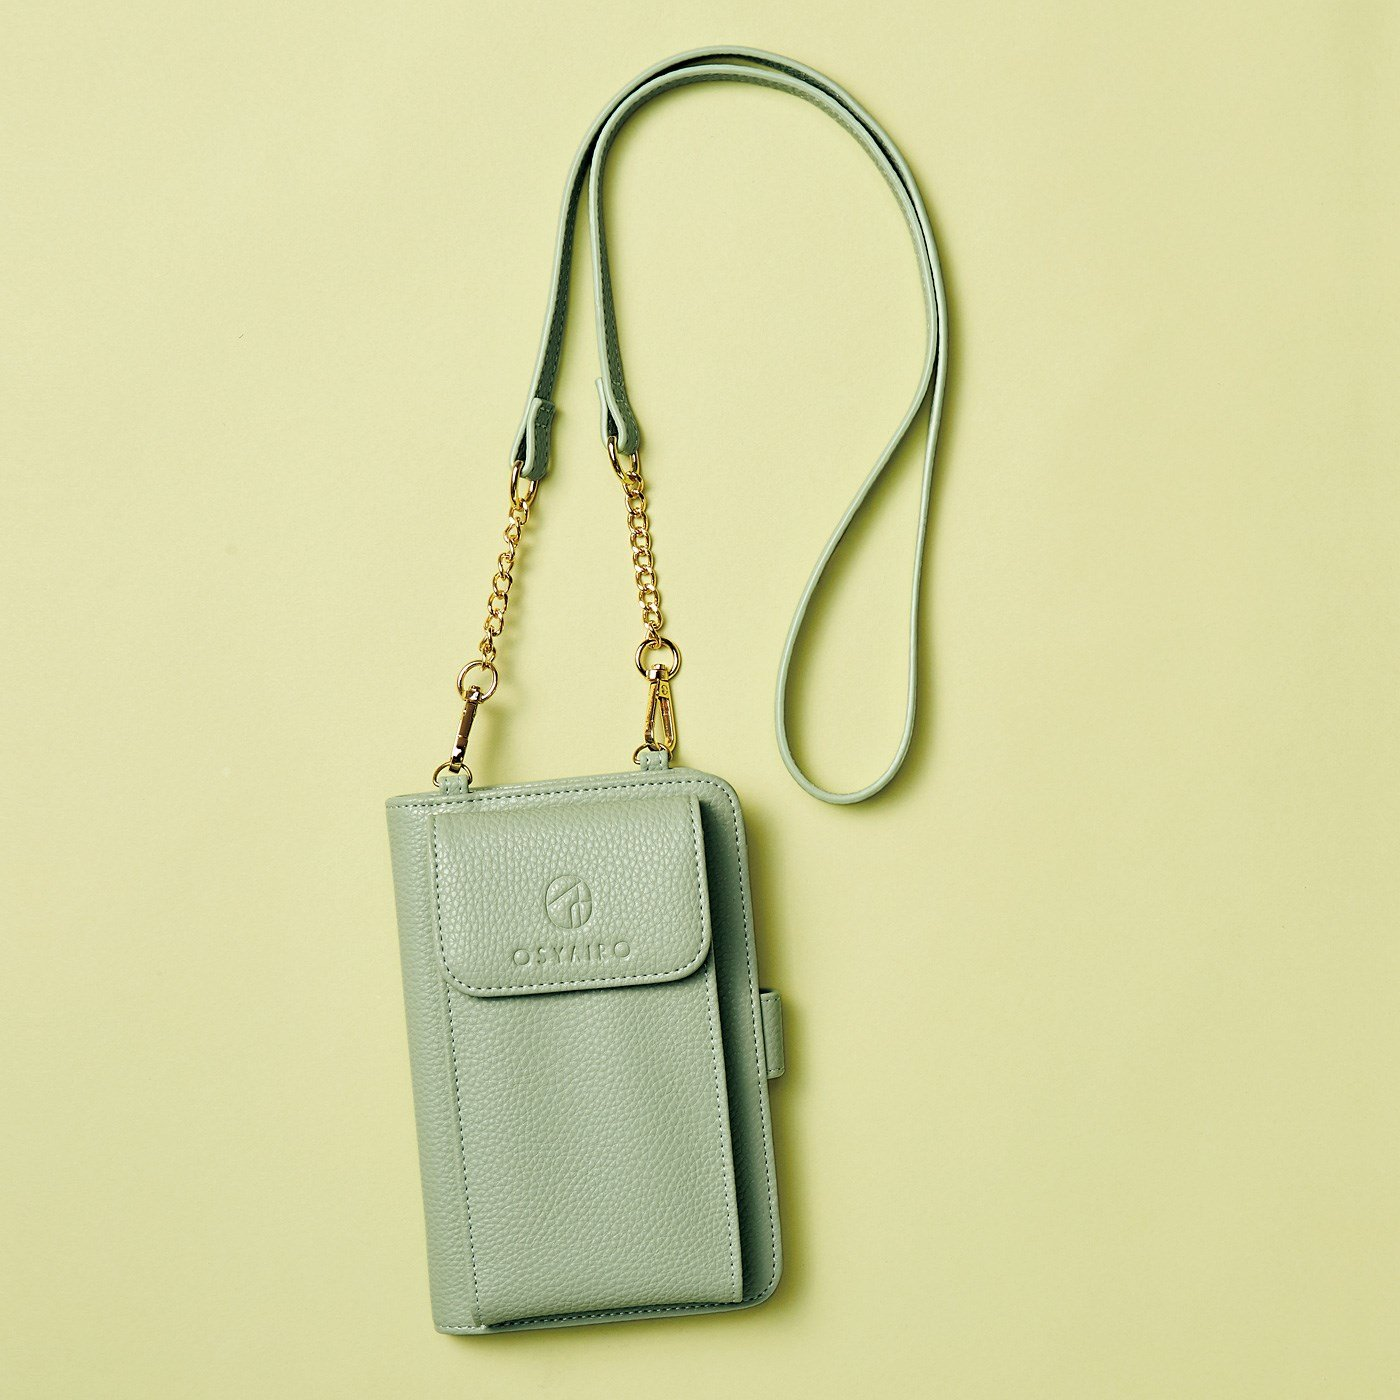 OSYAIRO フォトポケットが付いた スマホ&おさいふポーチ〈グリーン〉